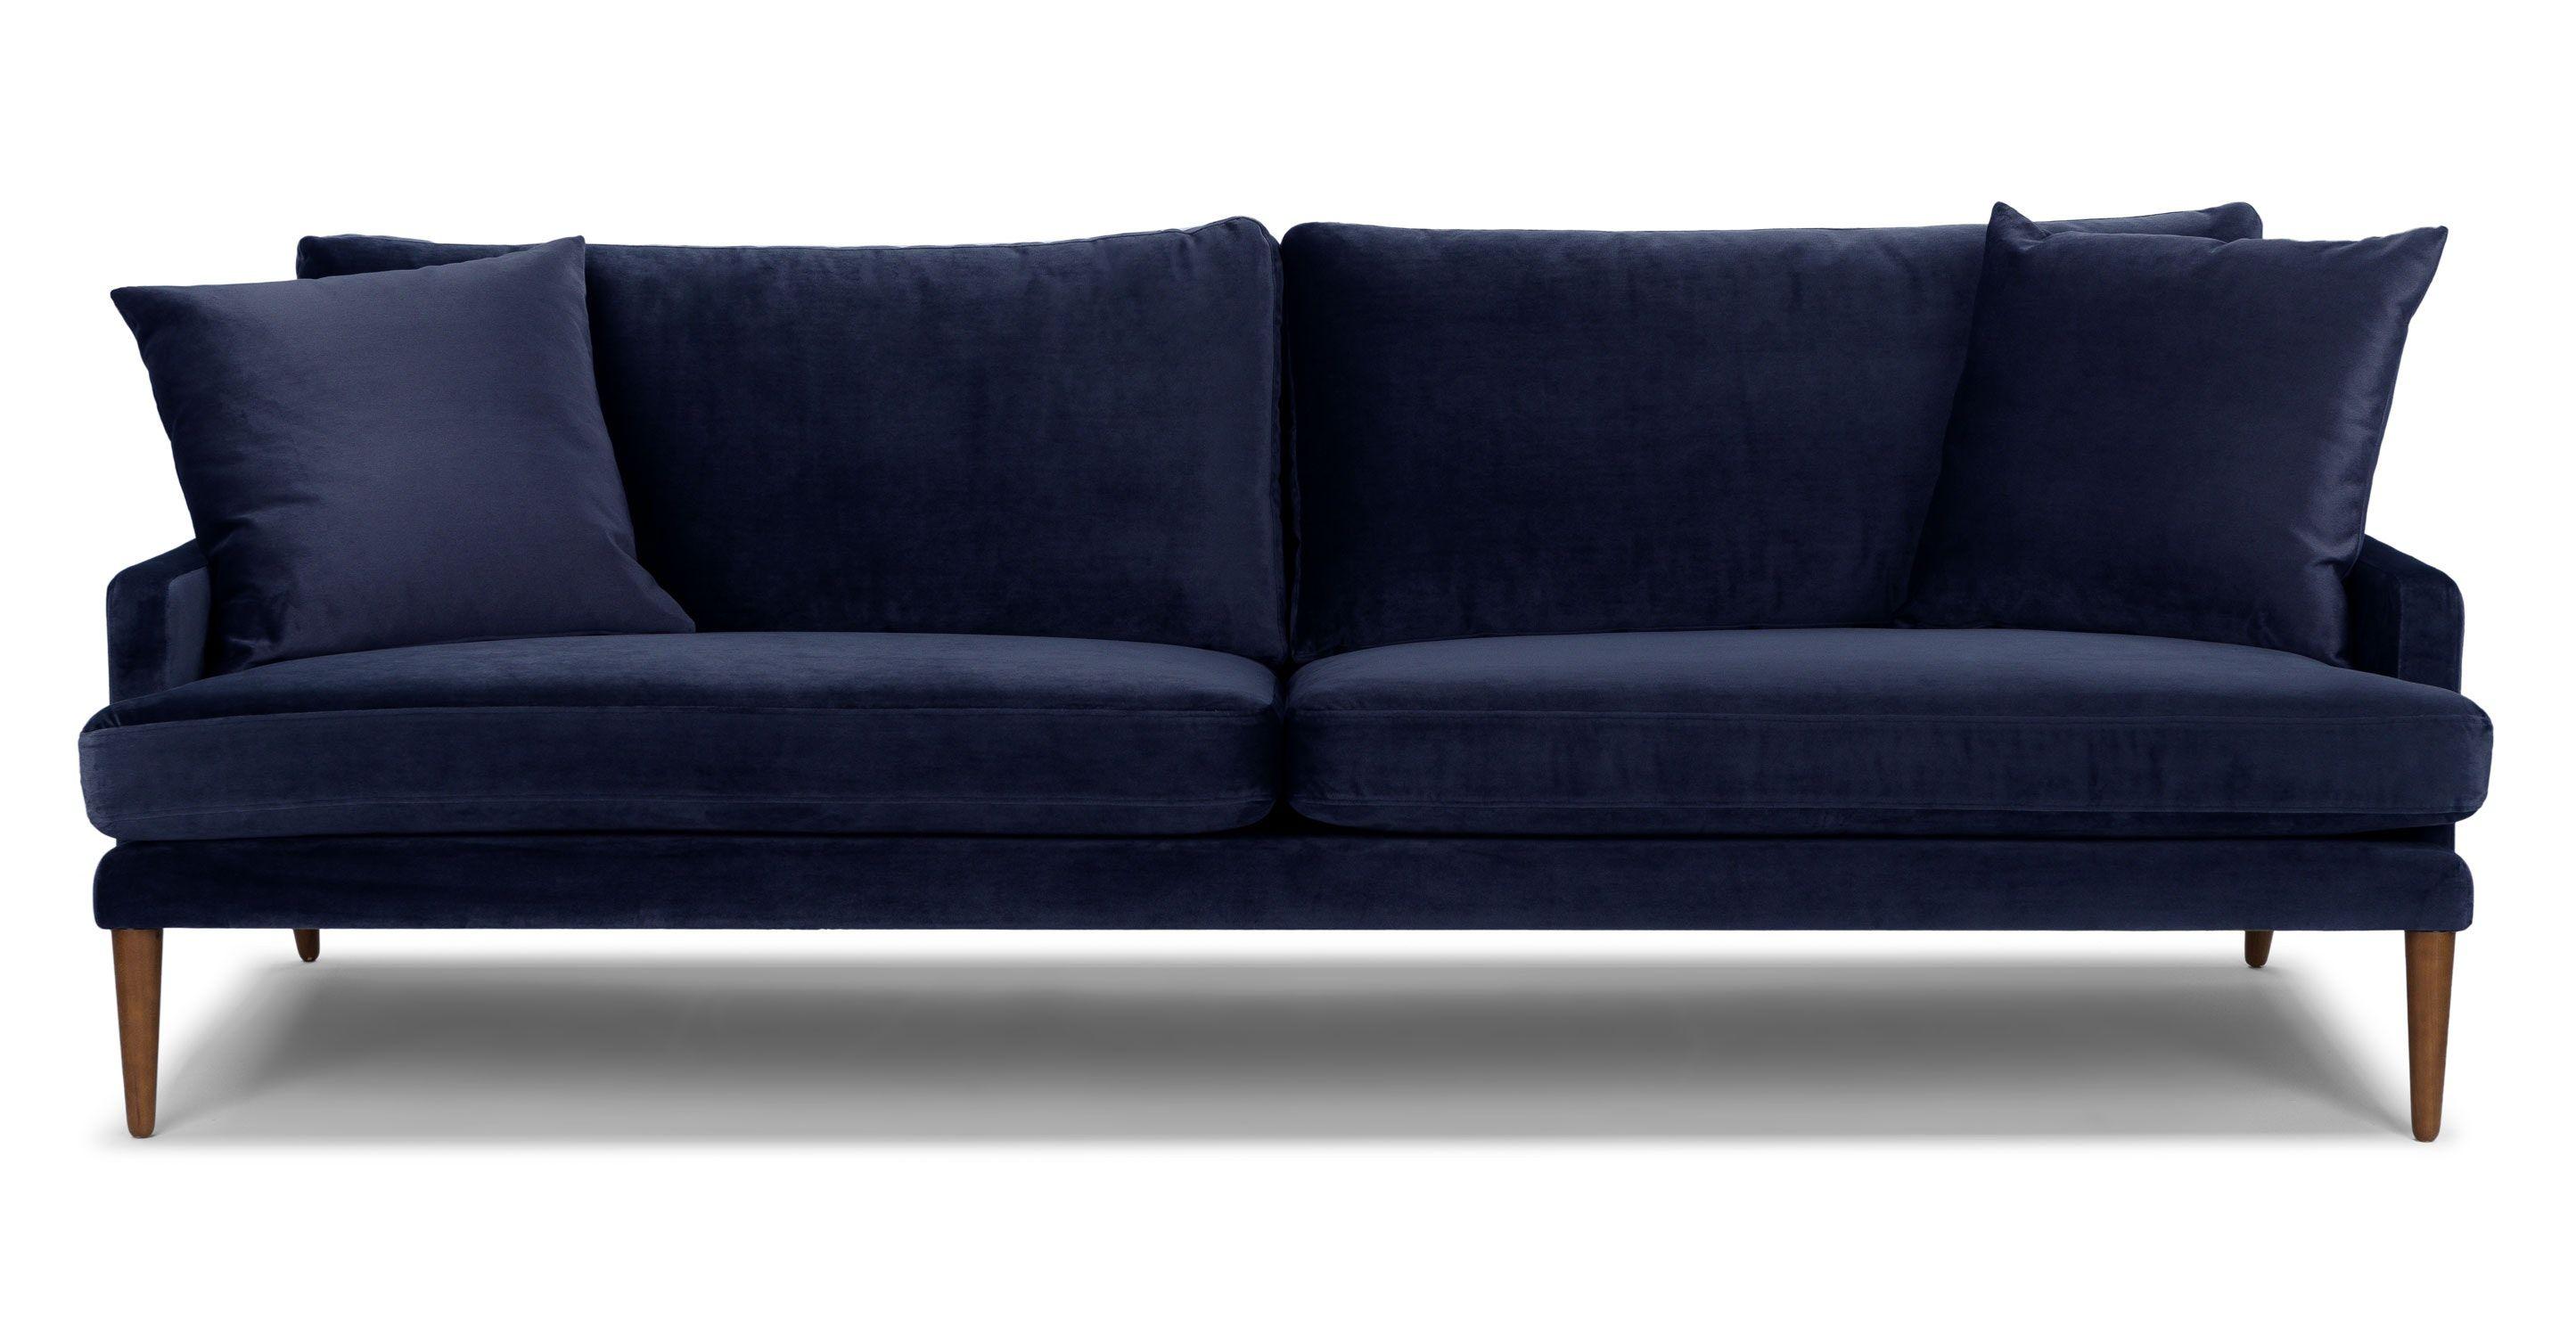 Blue Velvet Sofa 3 Seater Solid Wood Legs Article Luxu